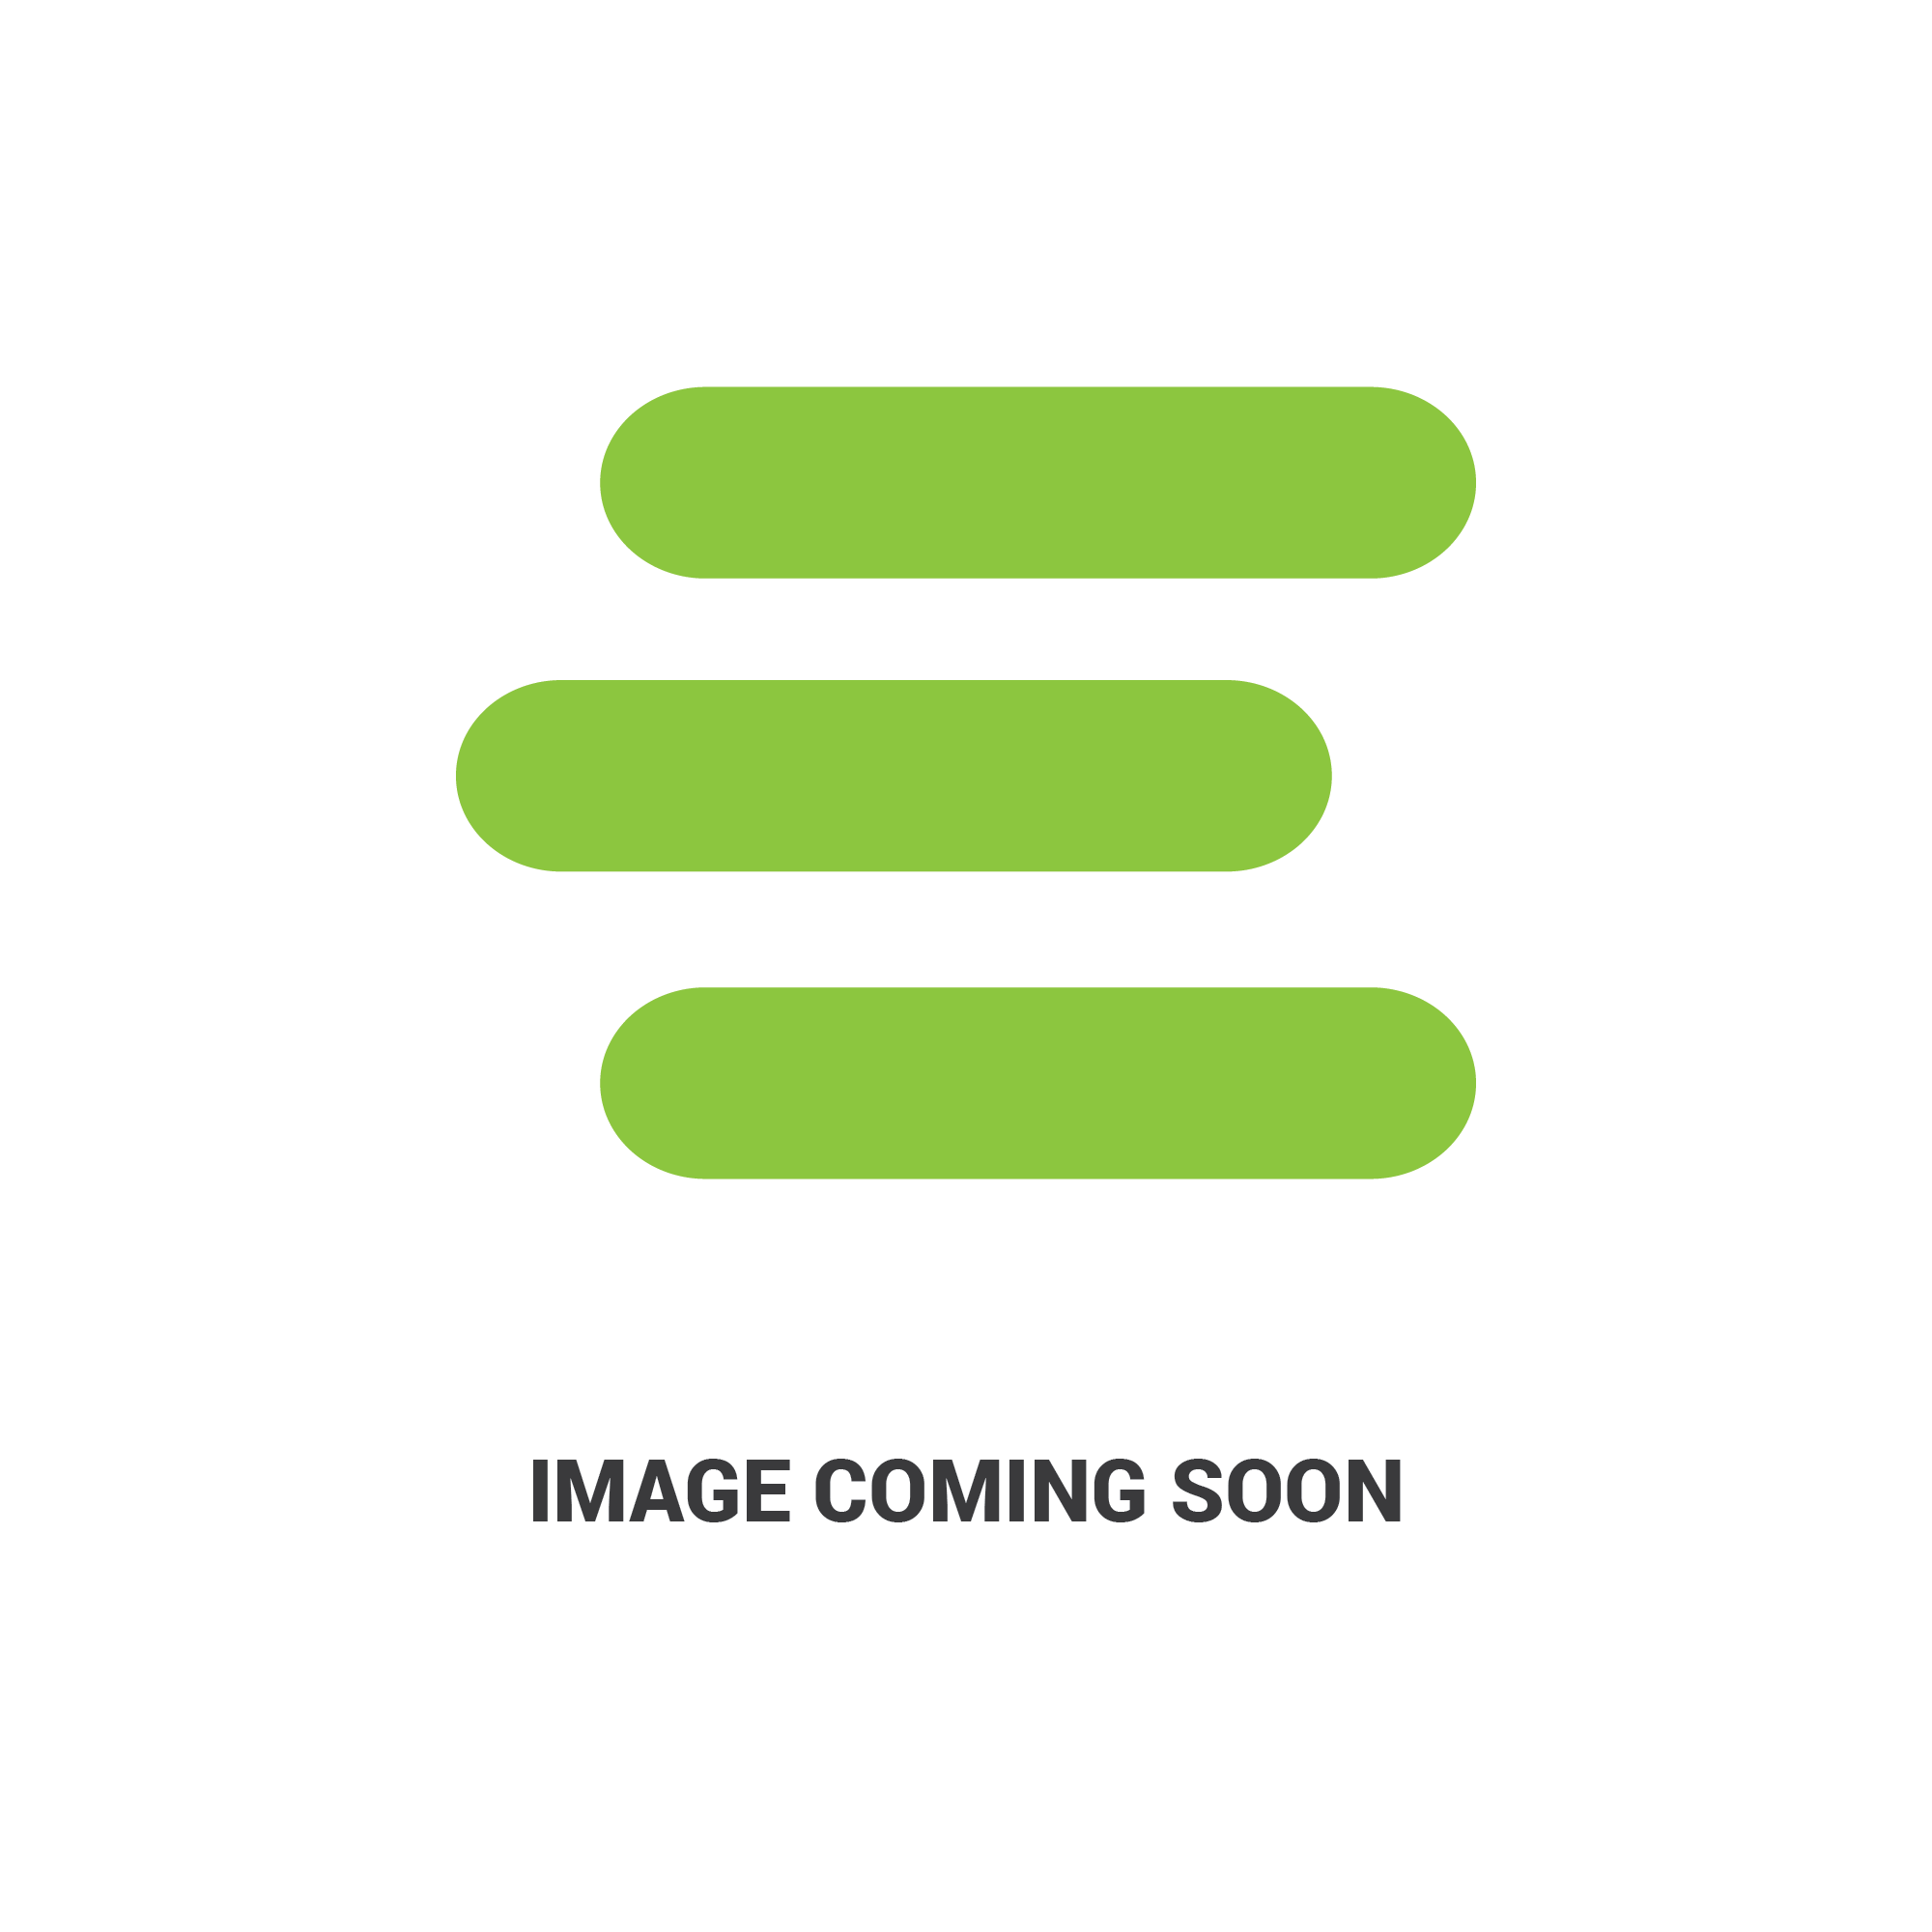 E-34550-13040edit 2.jpg